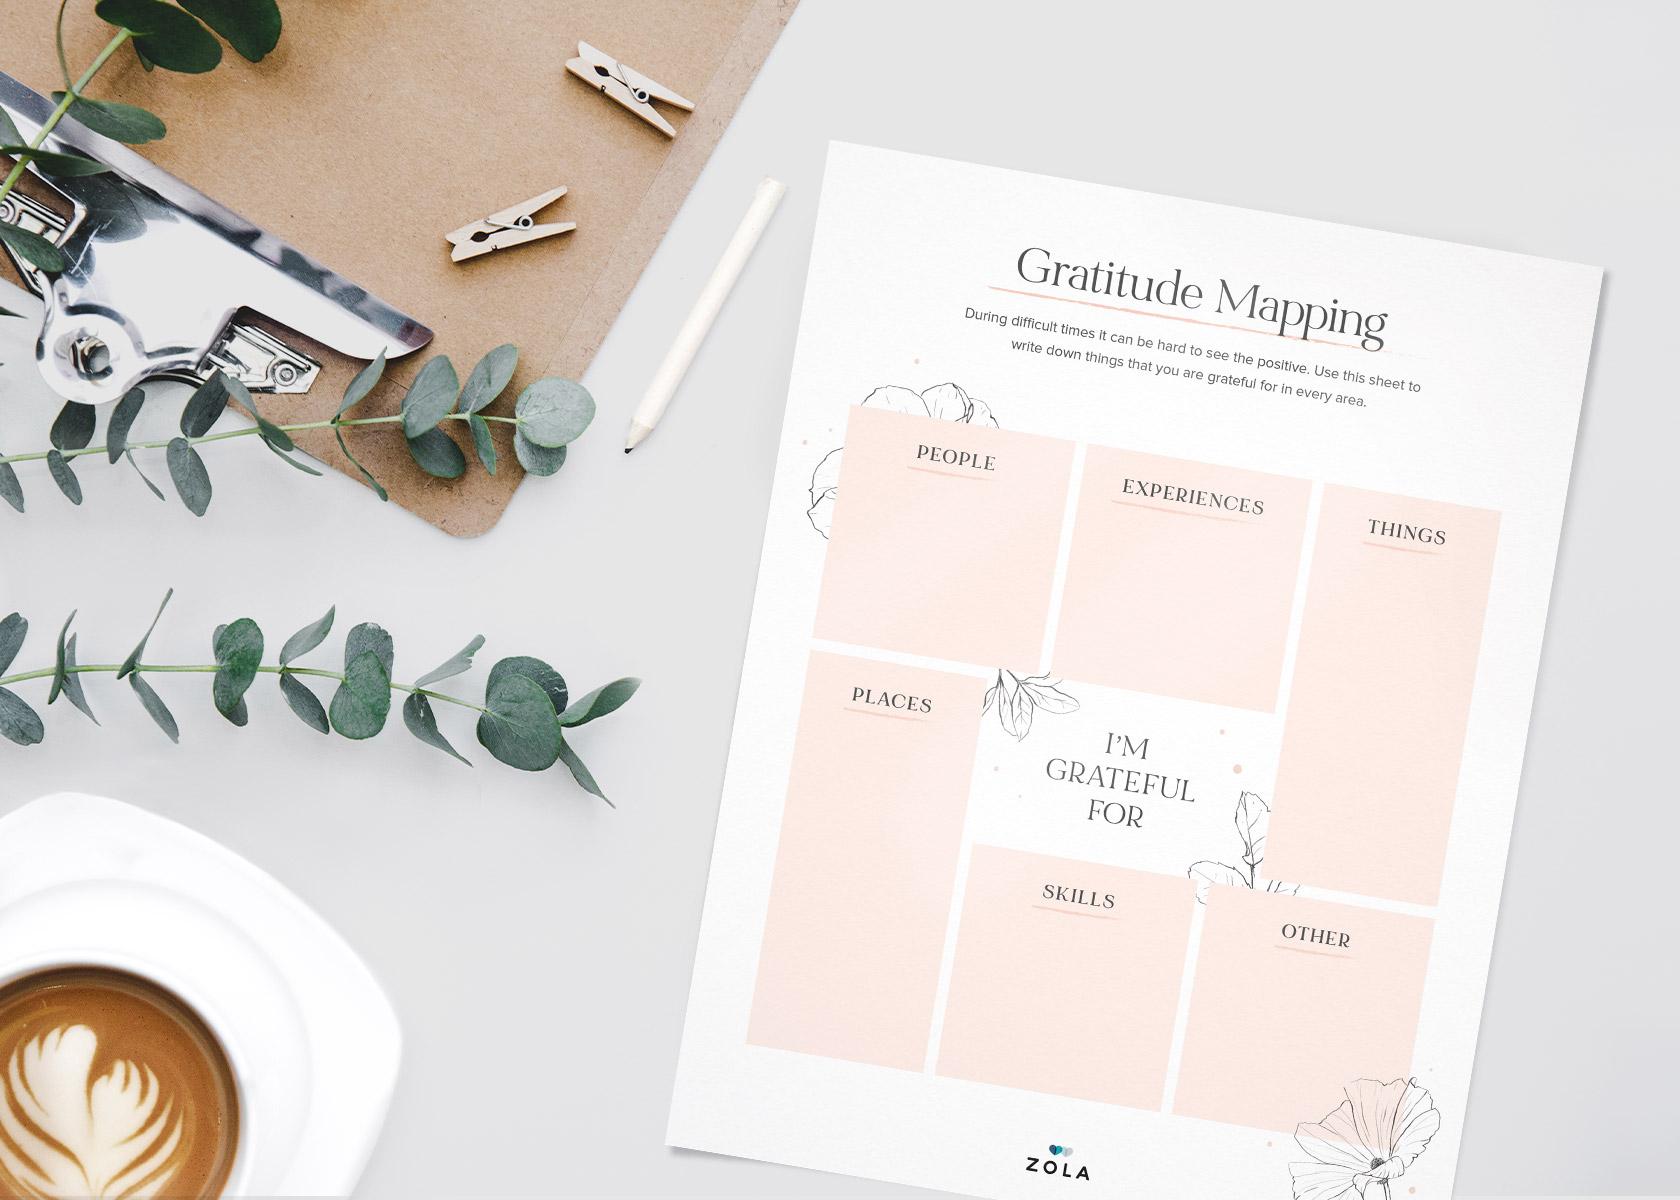 gratitude-mapping-mock-up